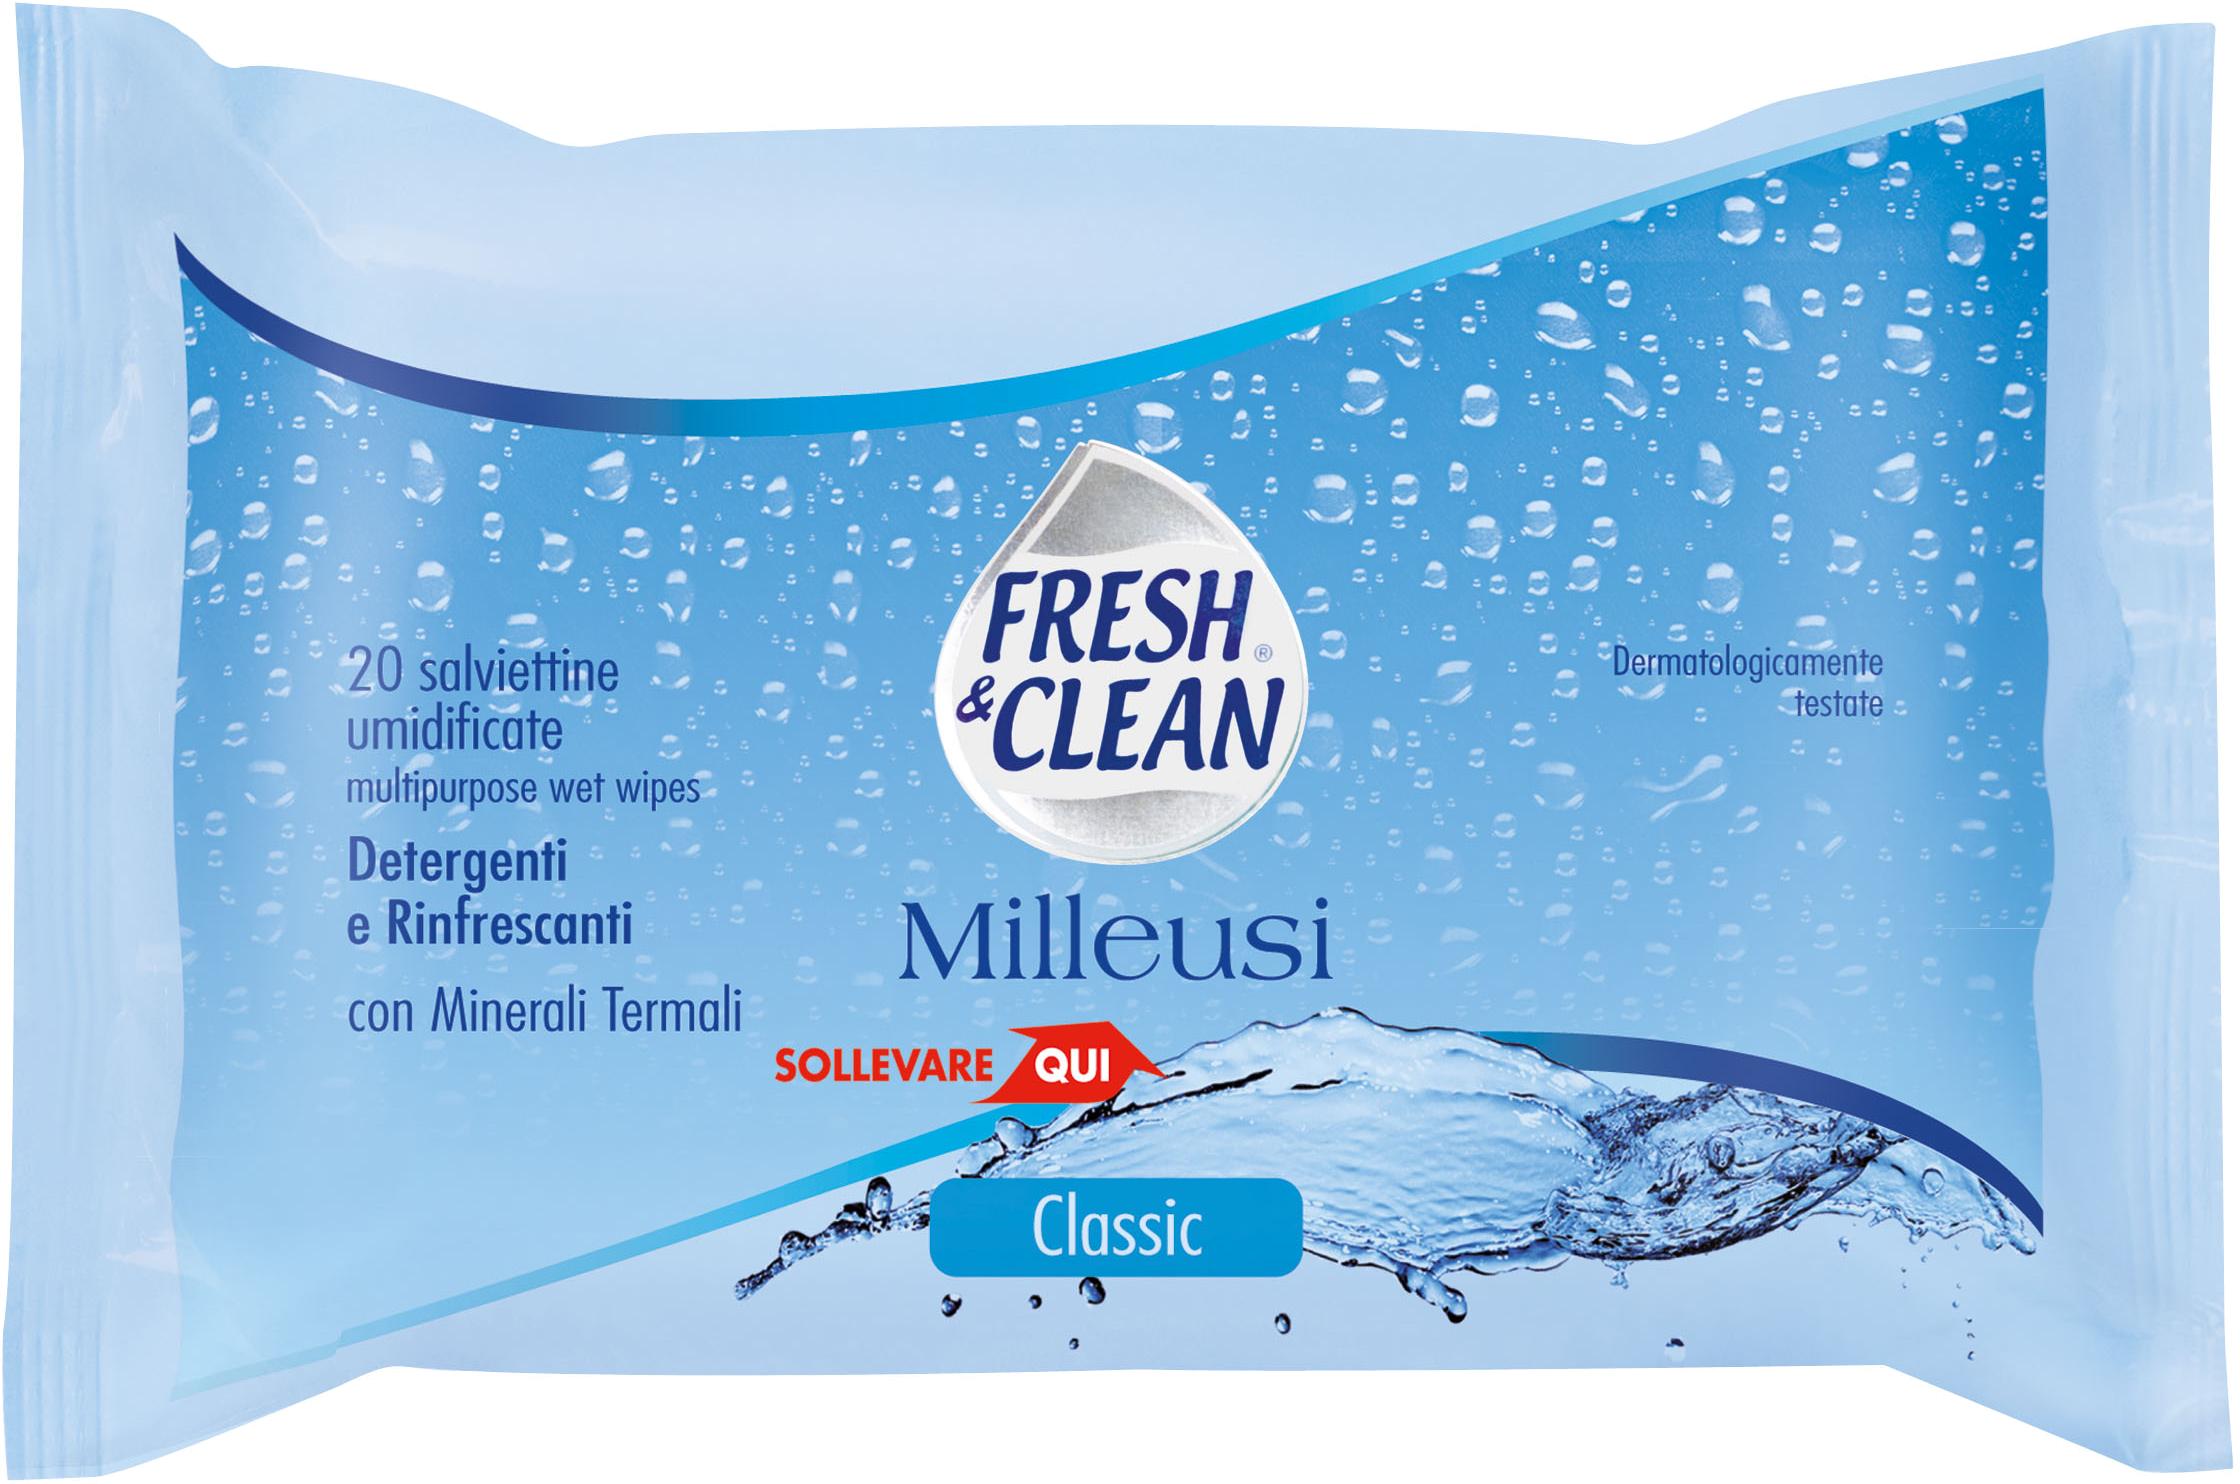 Fresh&Clean Milleusi Classic - salviettine umidificate